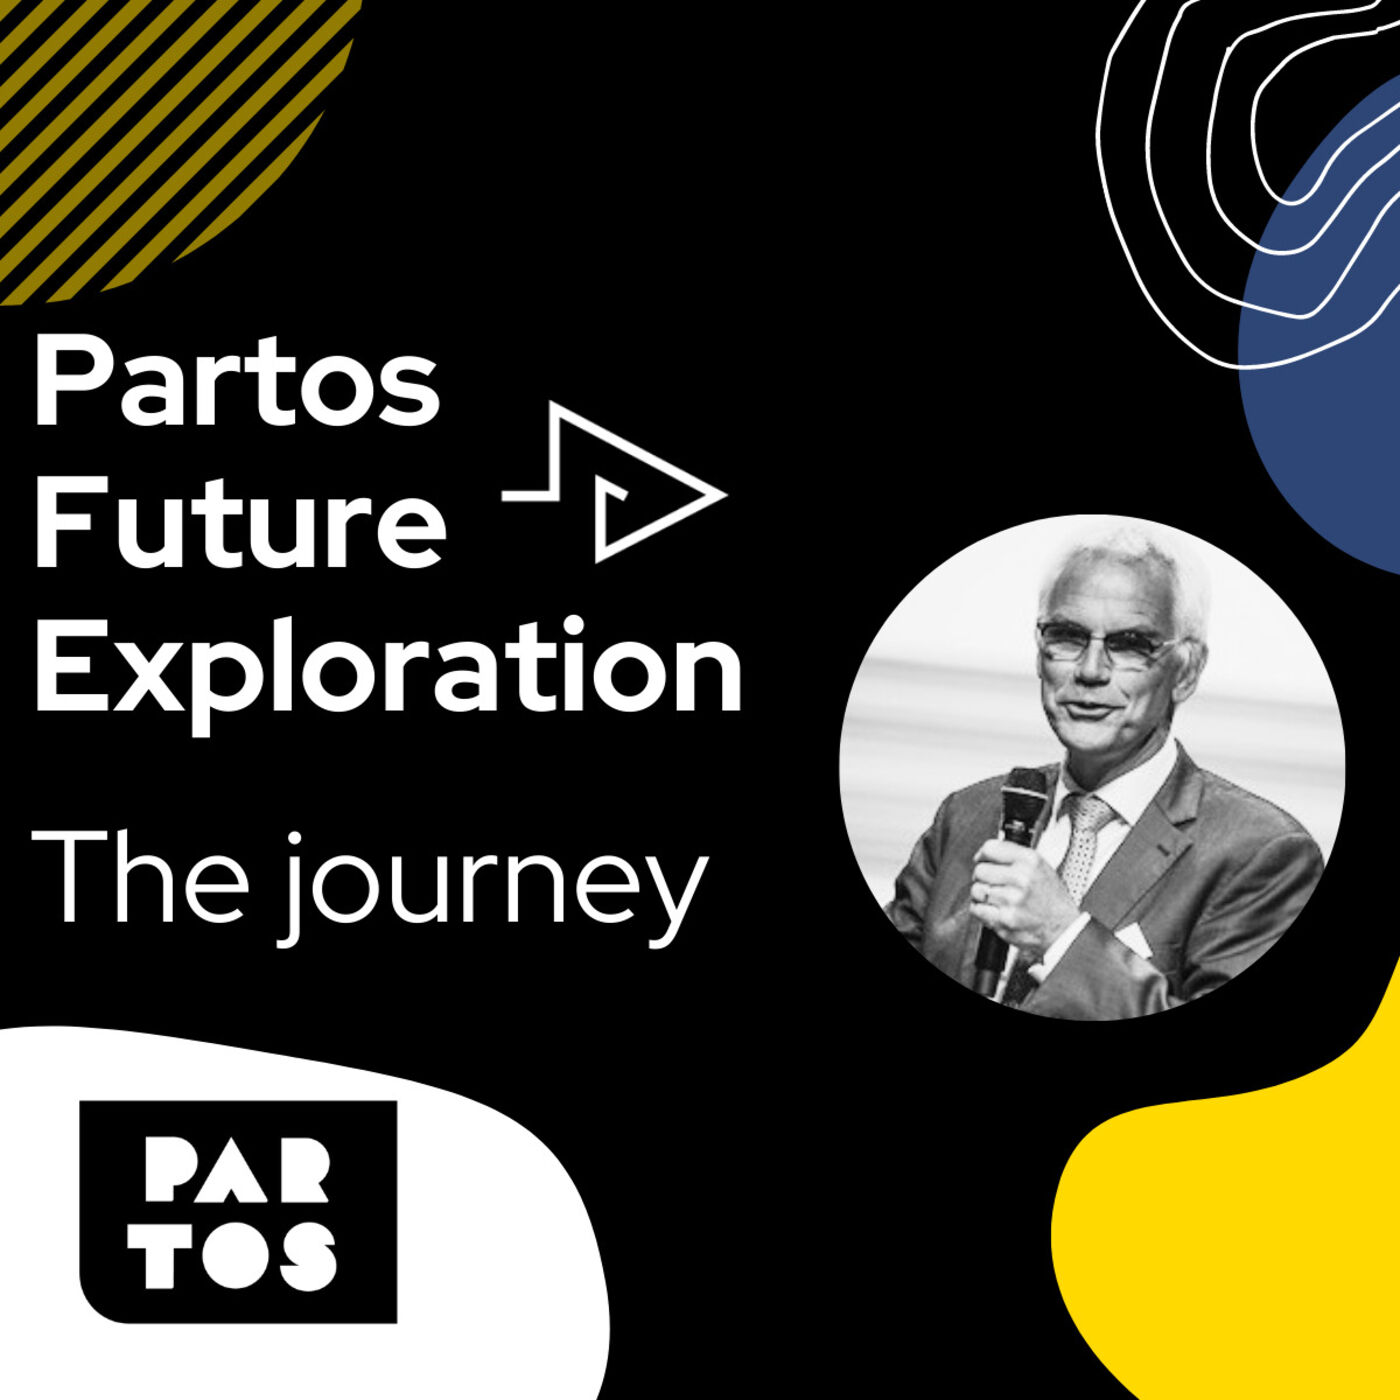 Partos Future Exploration - The Journey